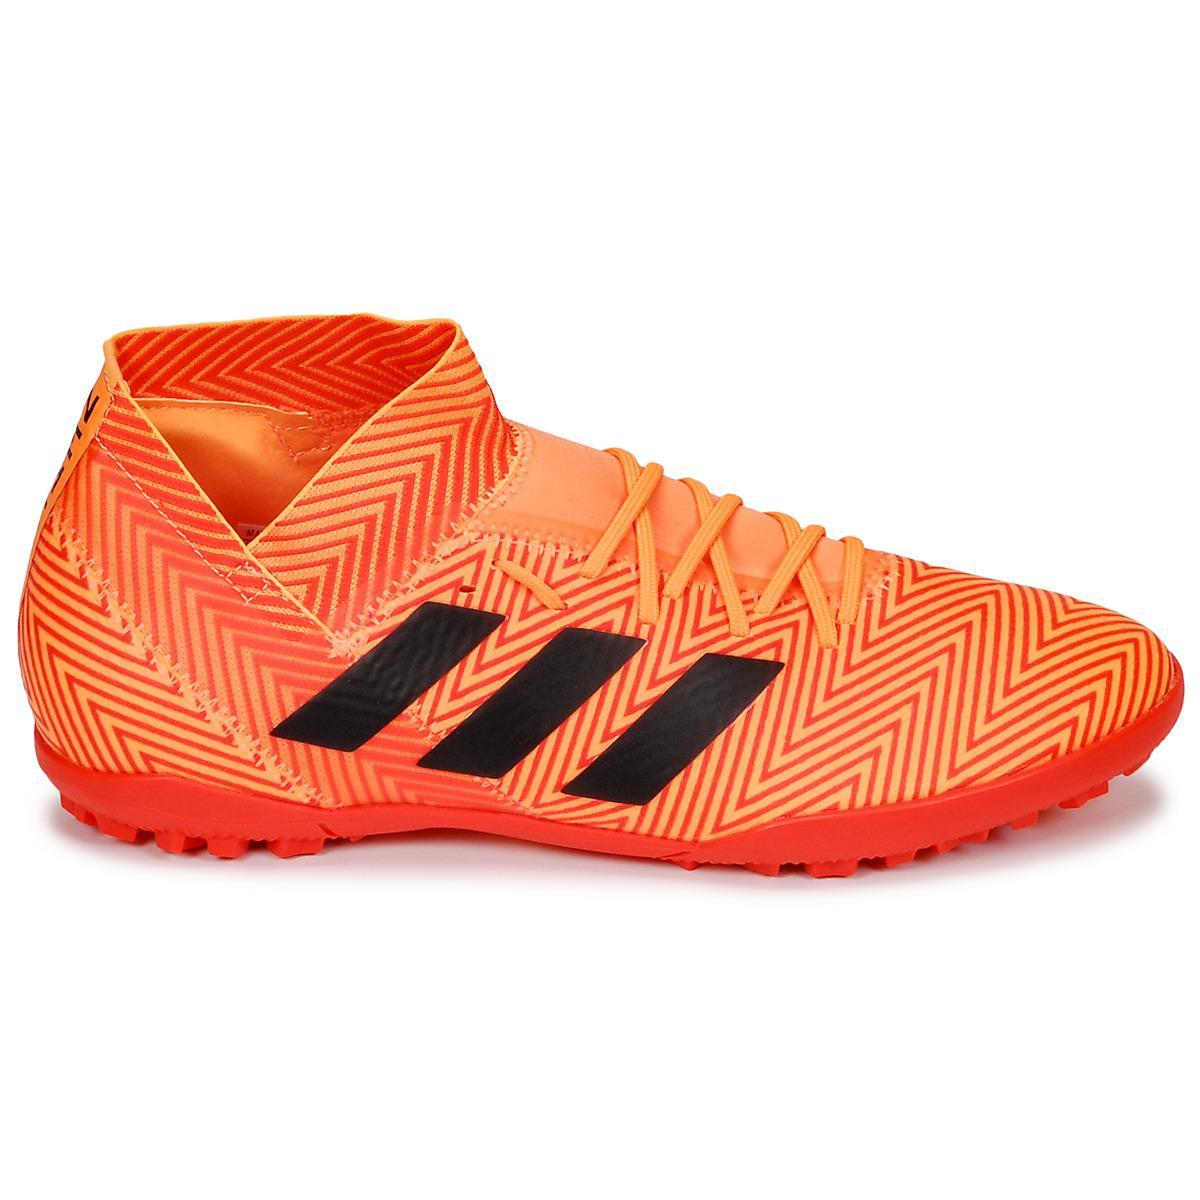 b735b23e7e8a Adidas - Nemeziz Tango 18.3 Tf Men's Football Boots In Orange for Men - Lyst.  View fullscreen